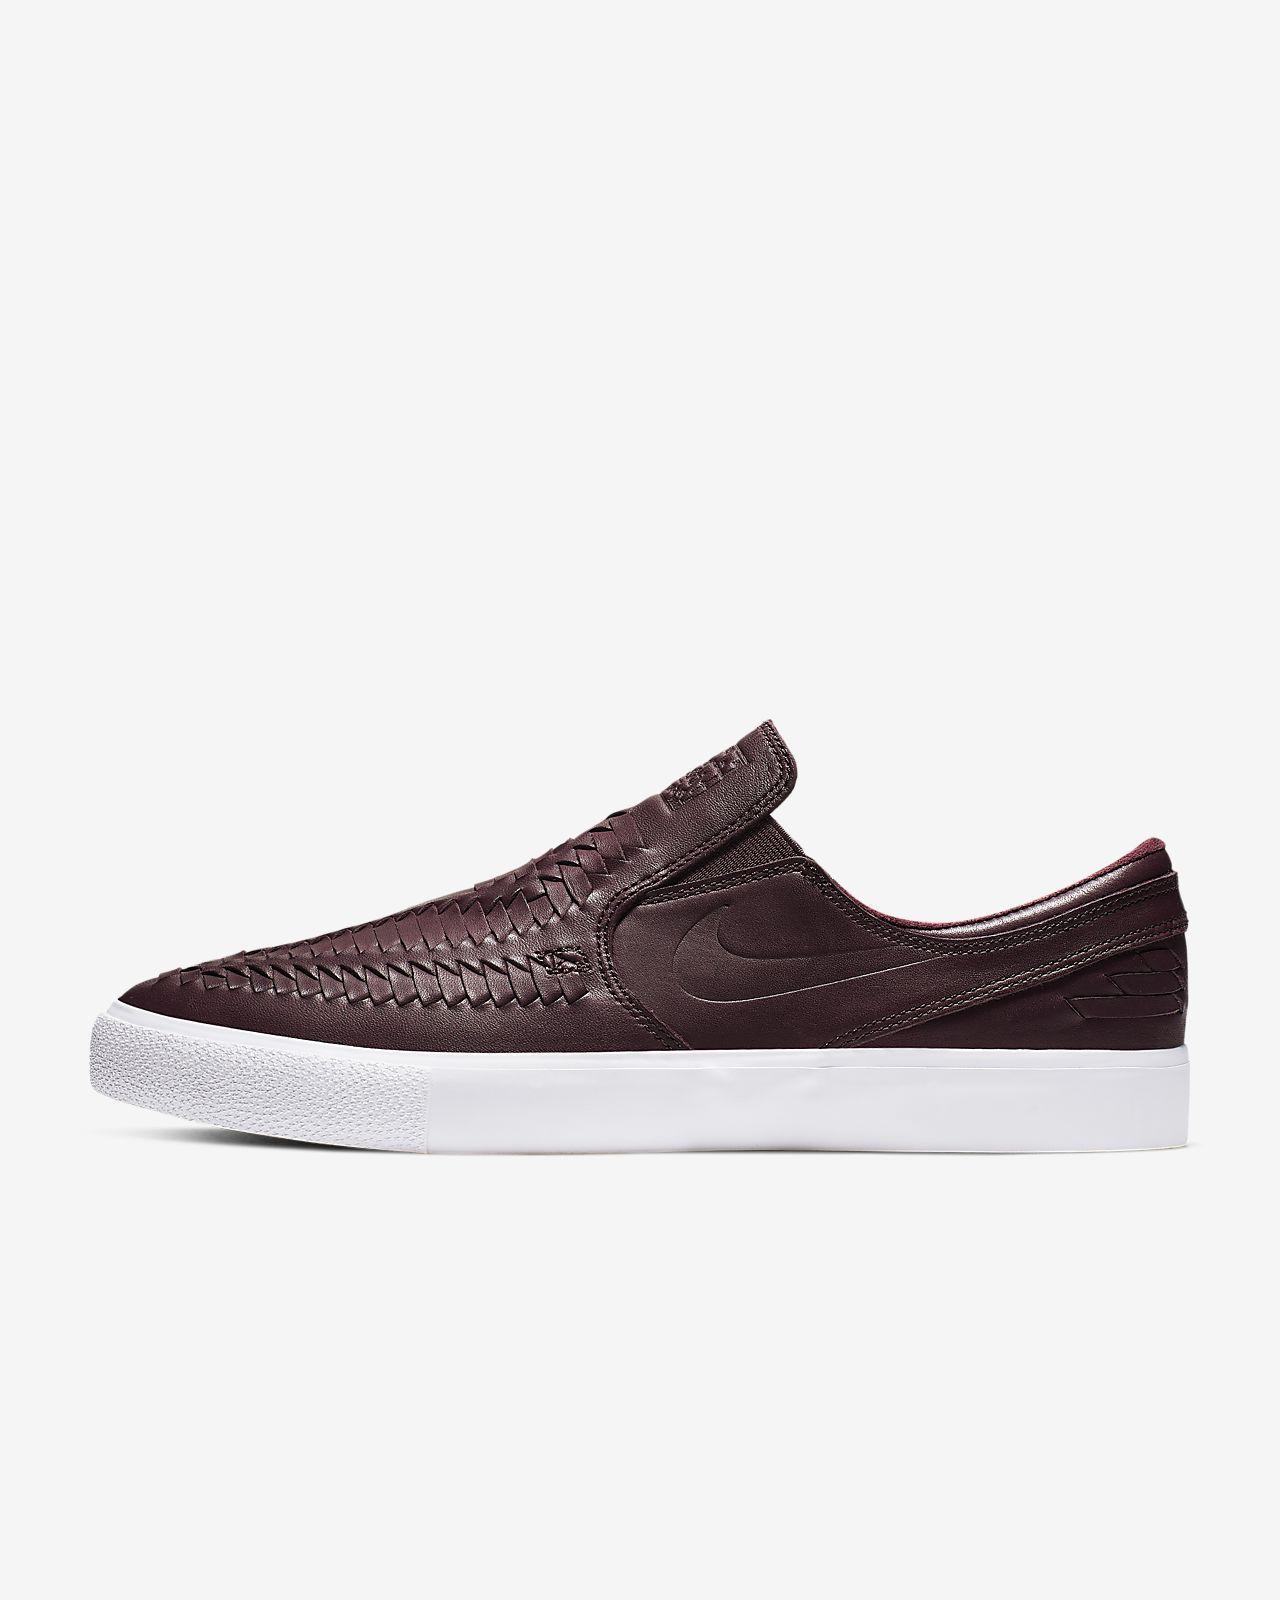 Nike SB Zoom Stefan Janoski Slip RM Crafted Kaykay Ayakkabısı